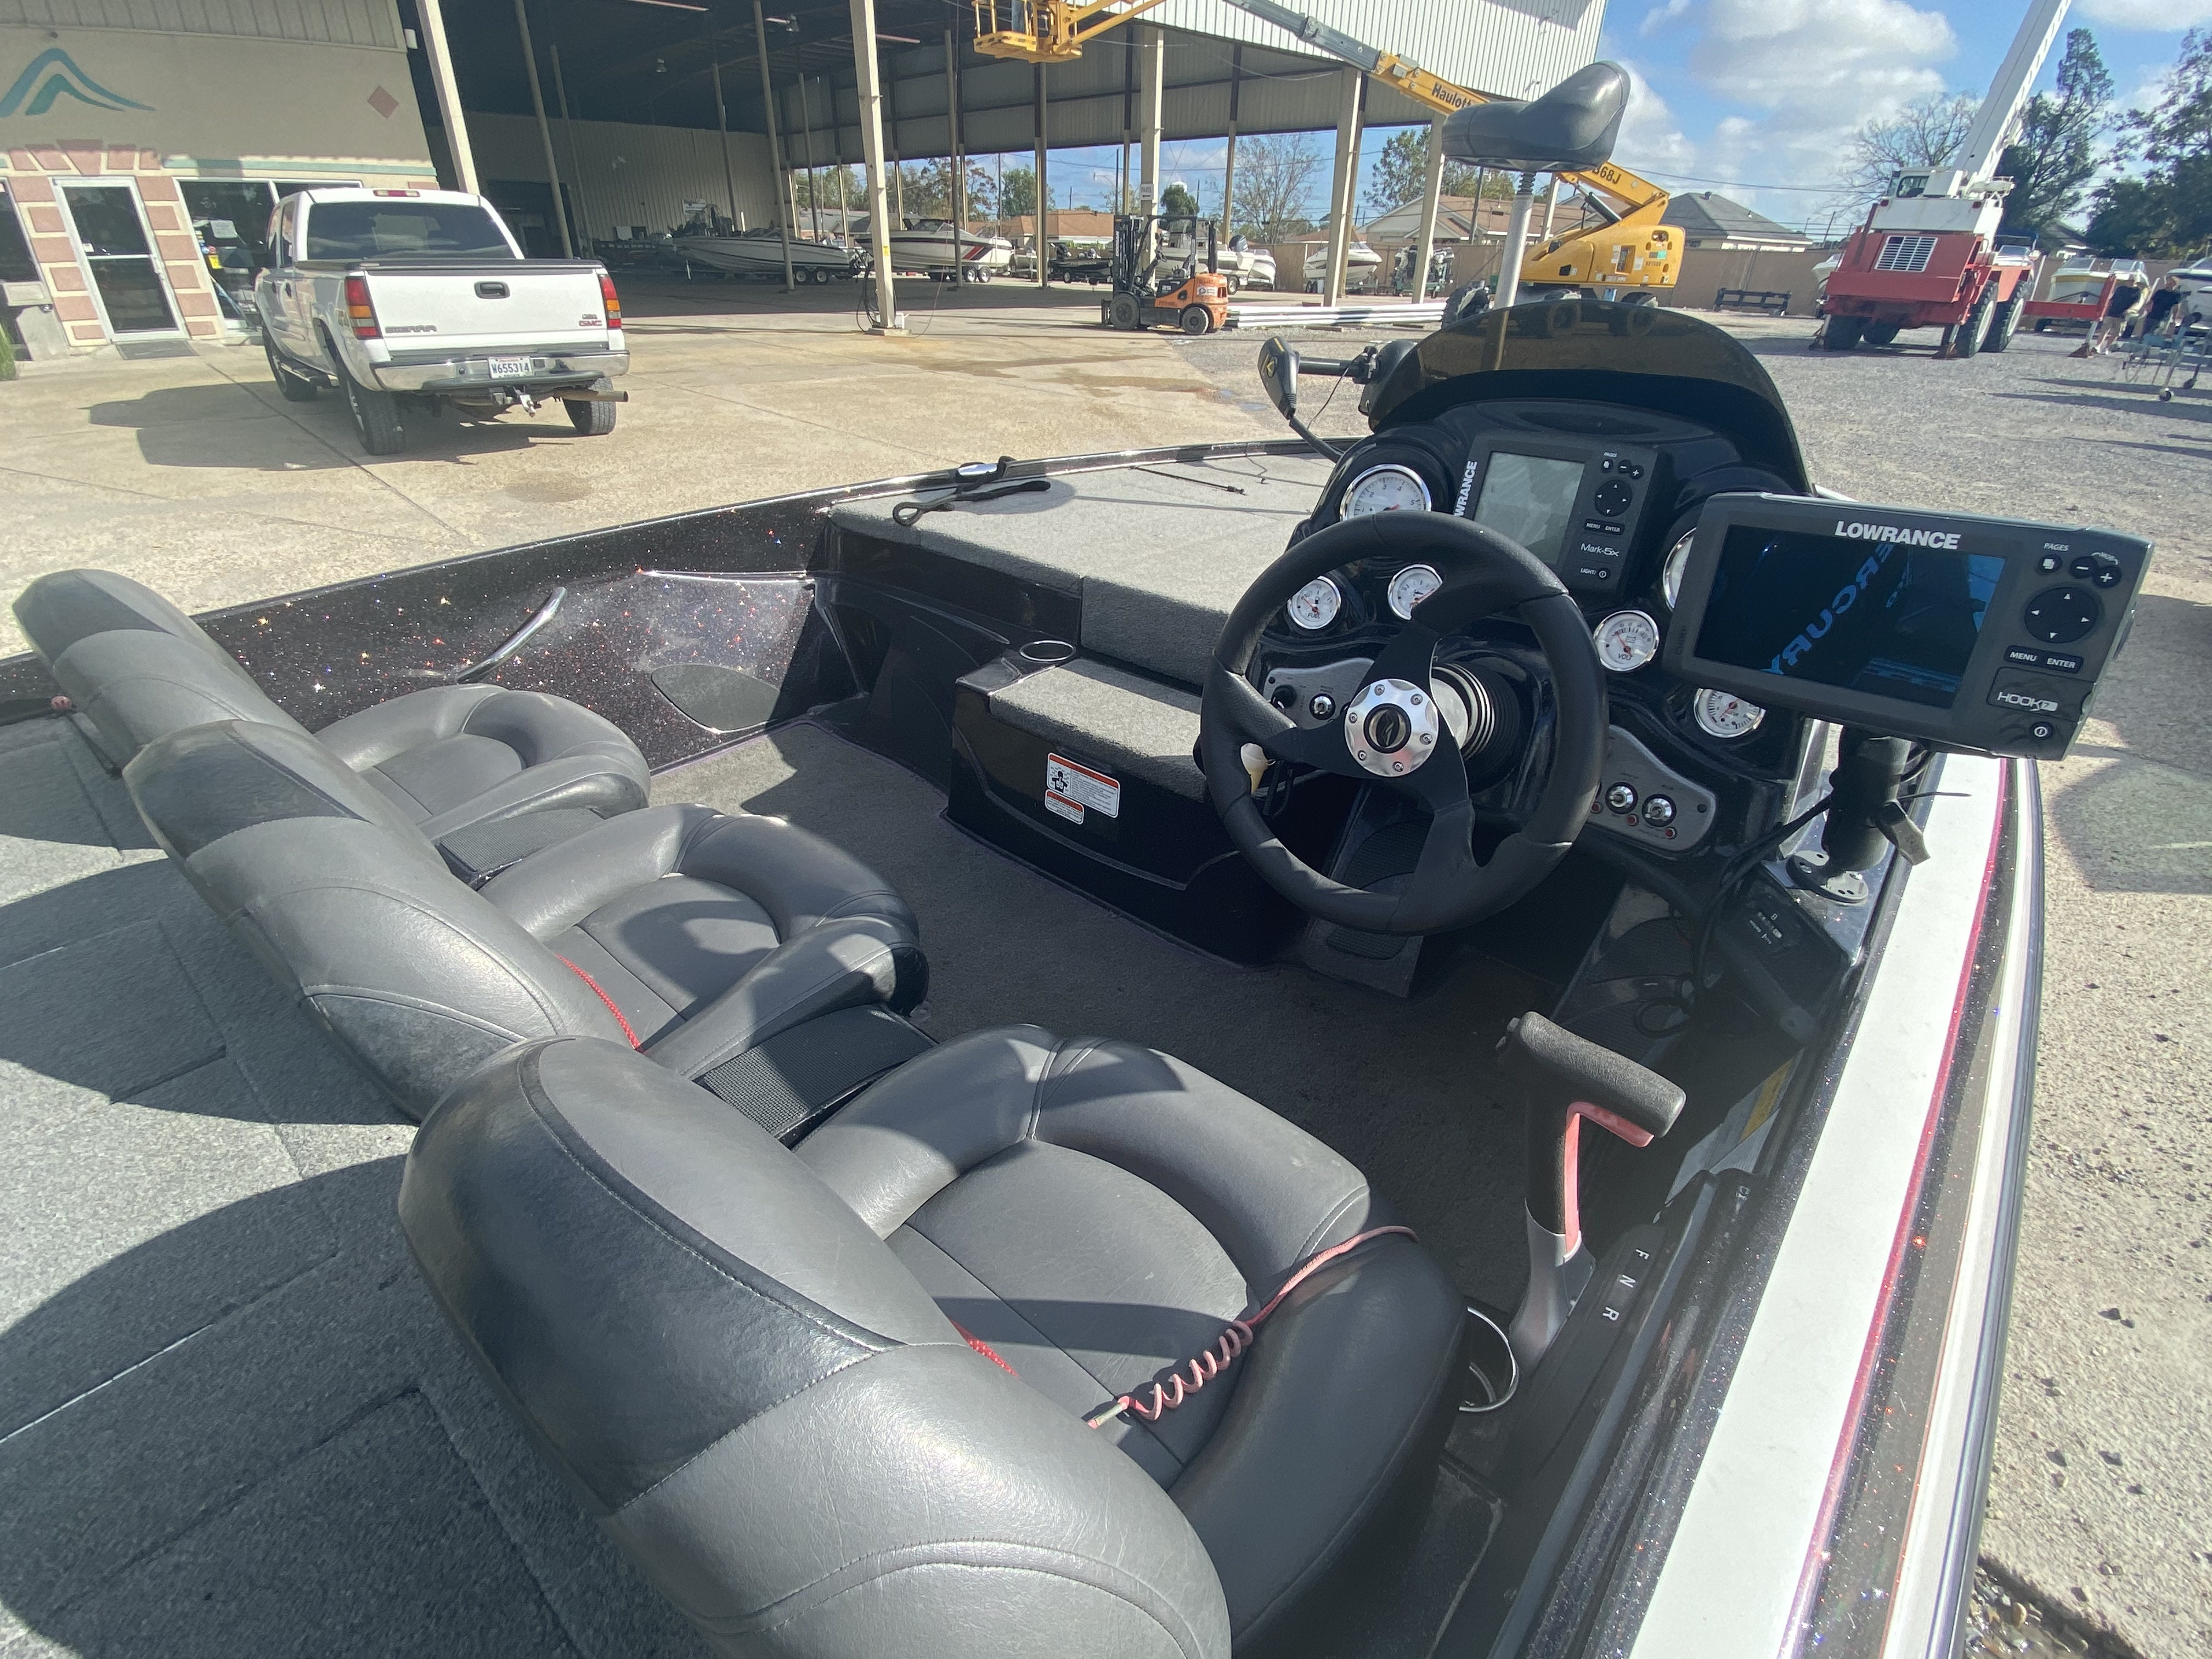 2011 Nitro boat for sale, model of the boat is Z6 & Image # 8 of 18